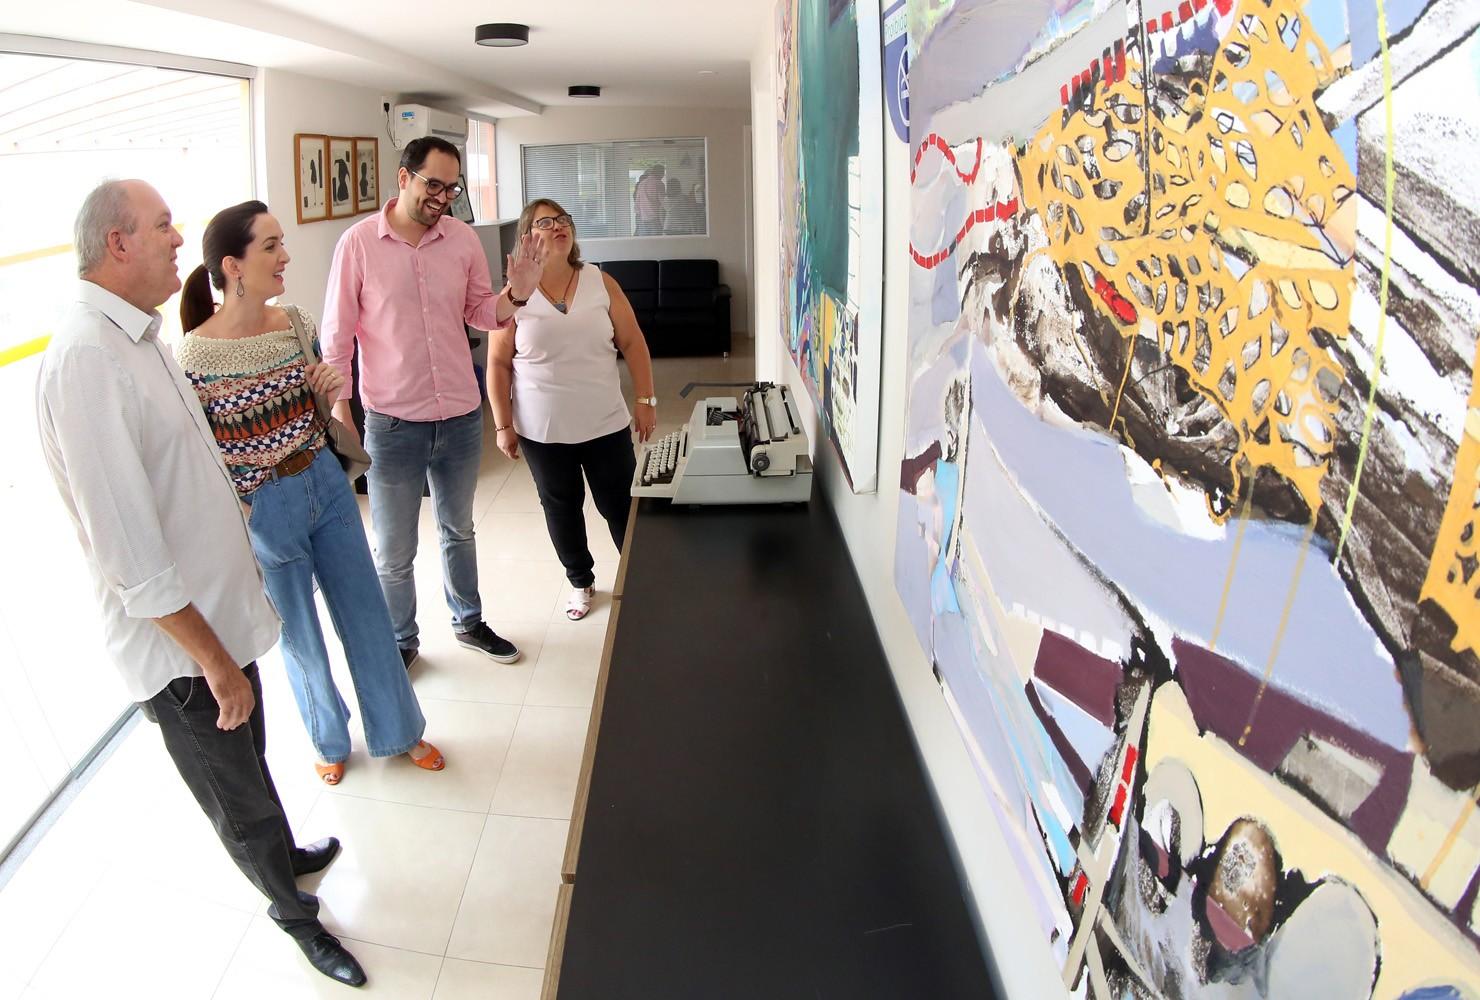 Acervo artístico vai ser exposto na Câmara de Santa Barbara d'Oeste